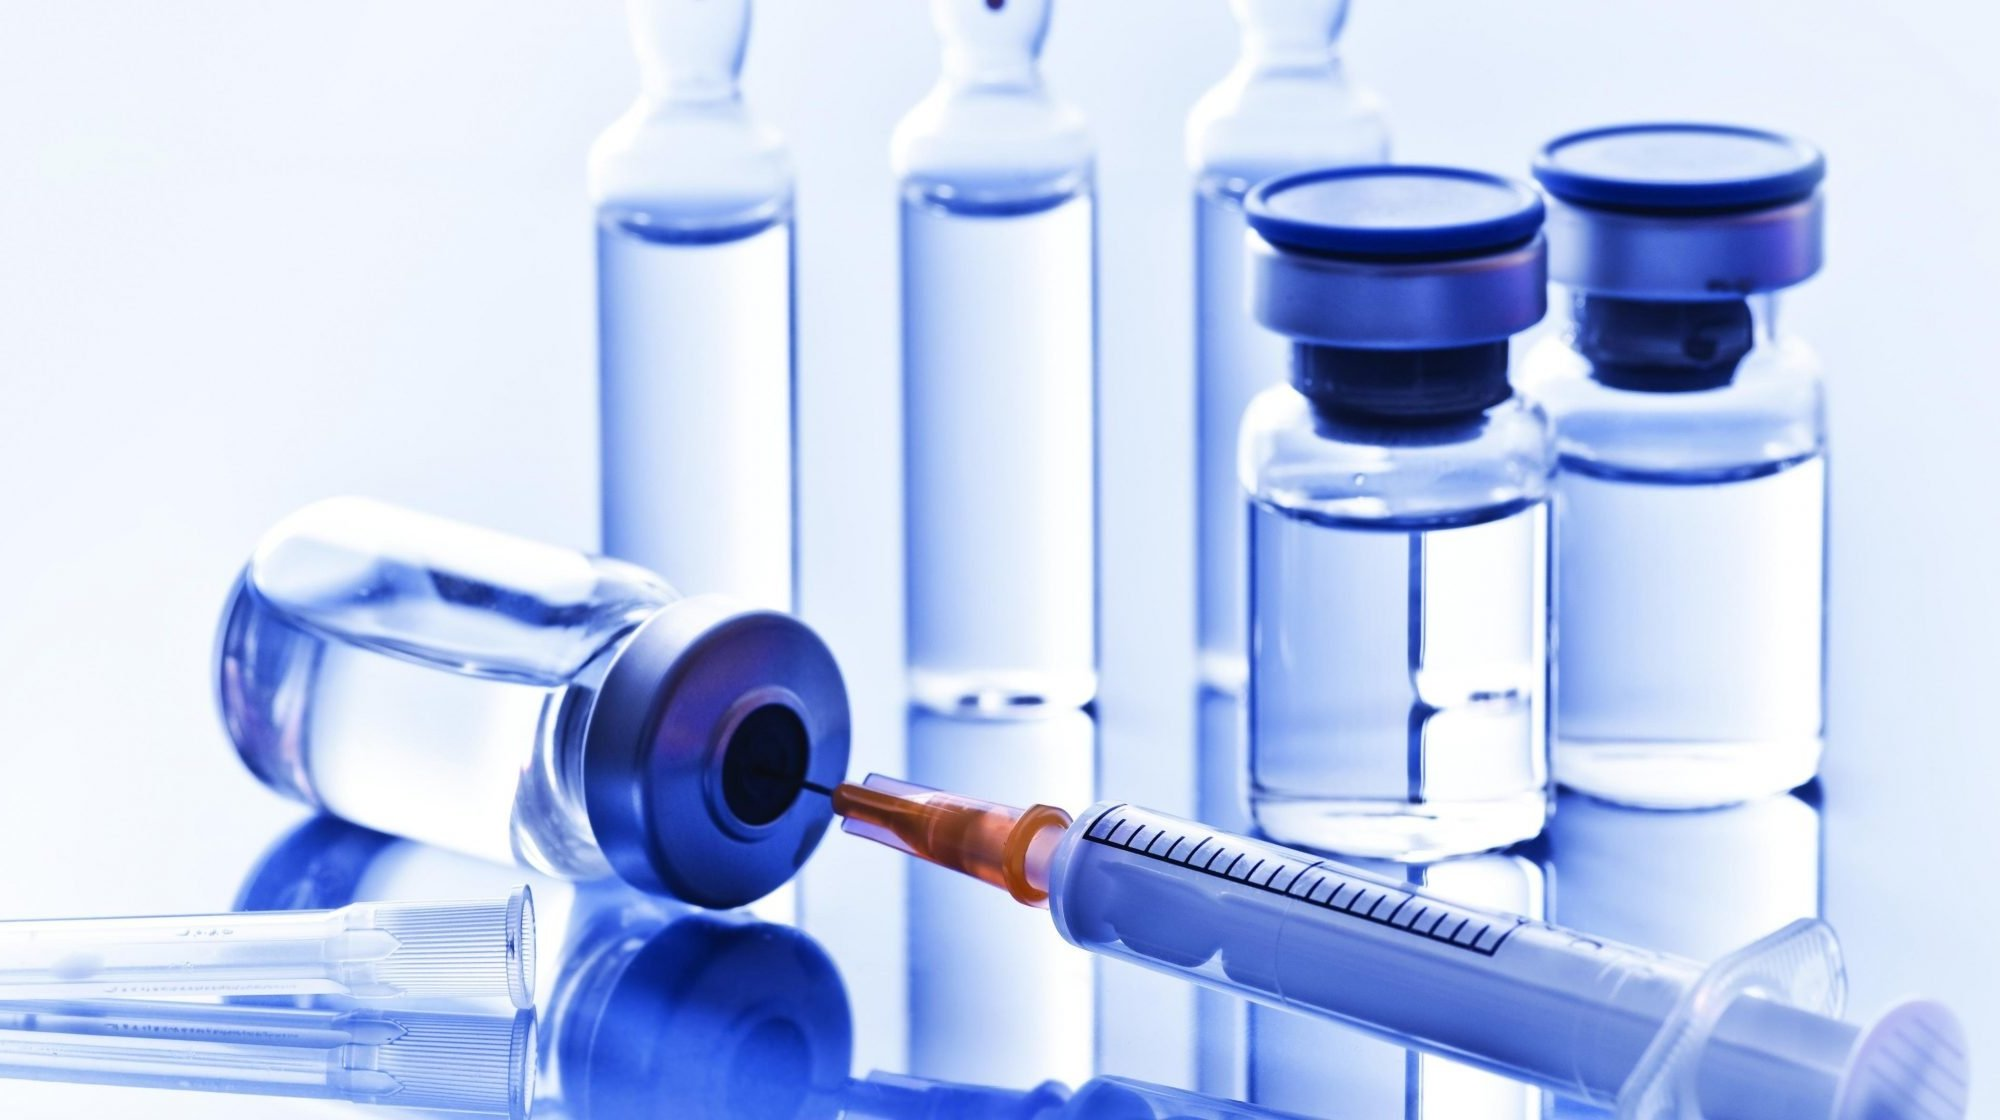 Corvelva vaccine research